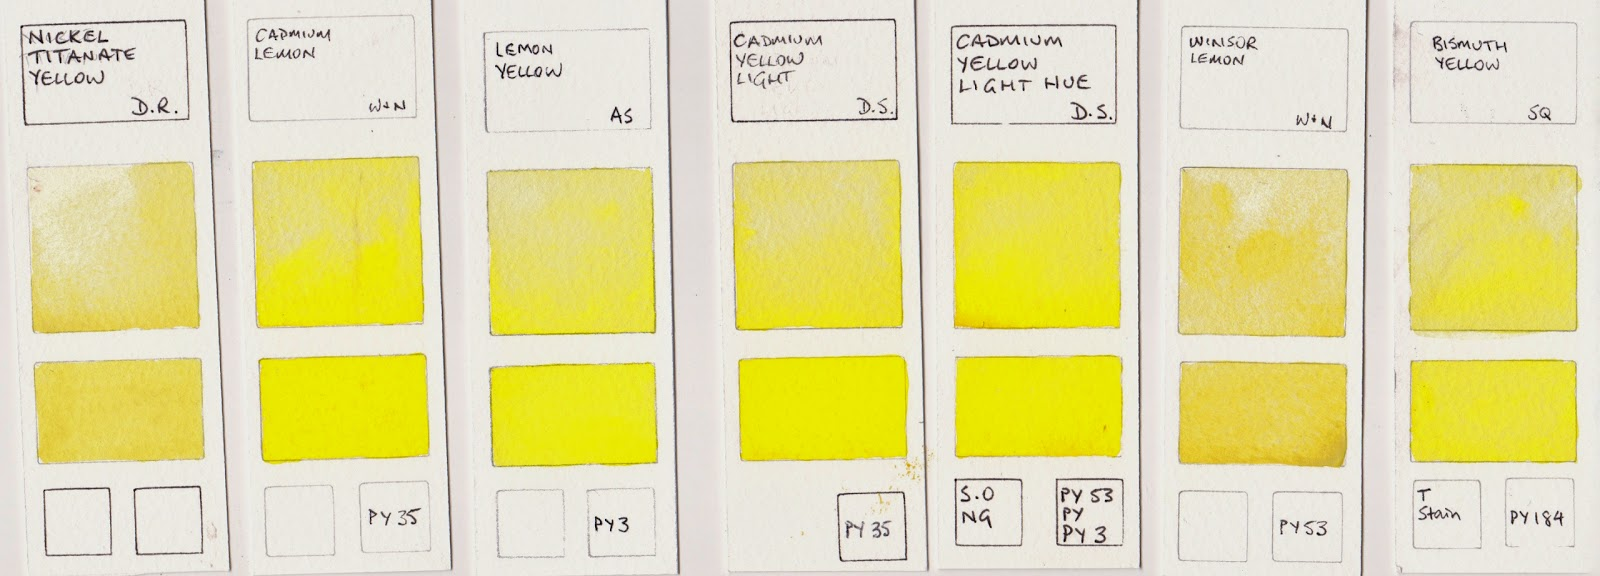 Jane Blundell Artist: Watercolour Comparisons 7 - Yellows